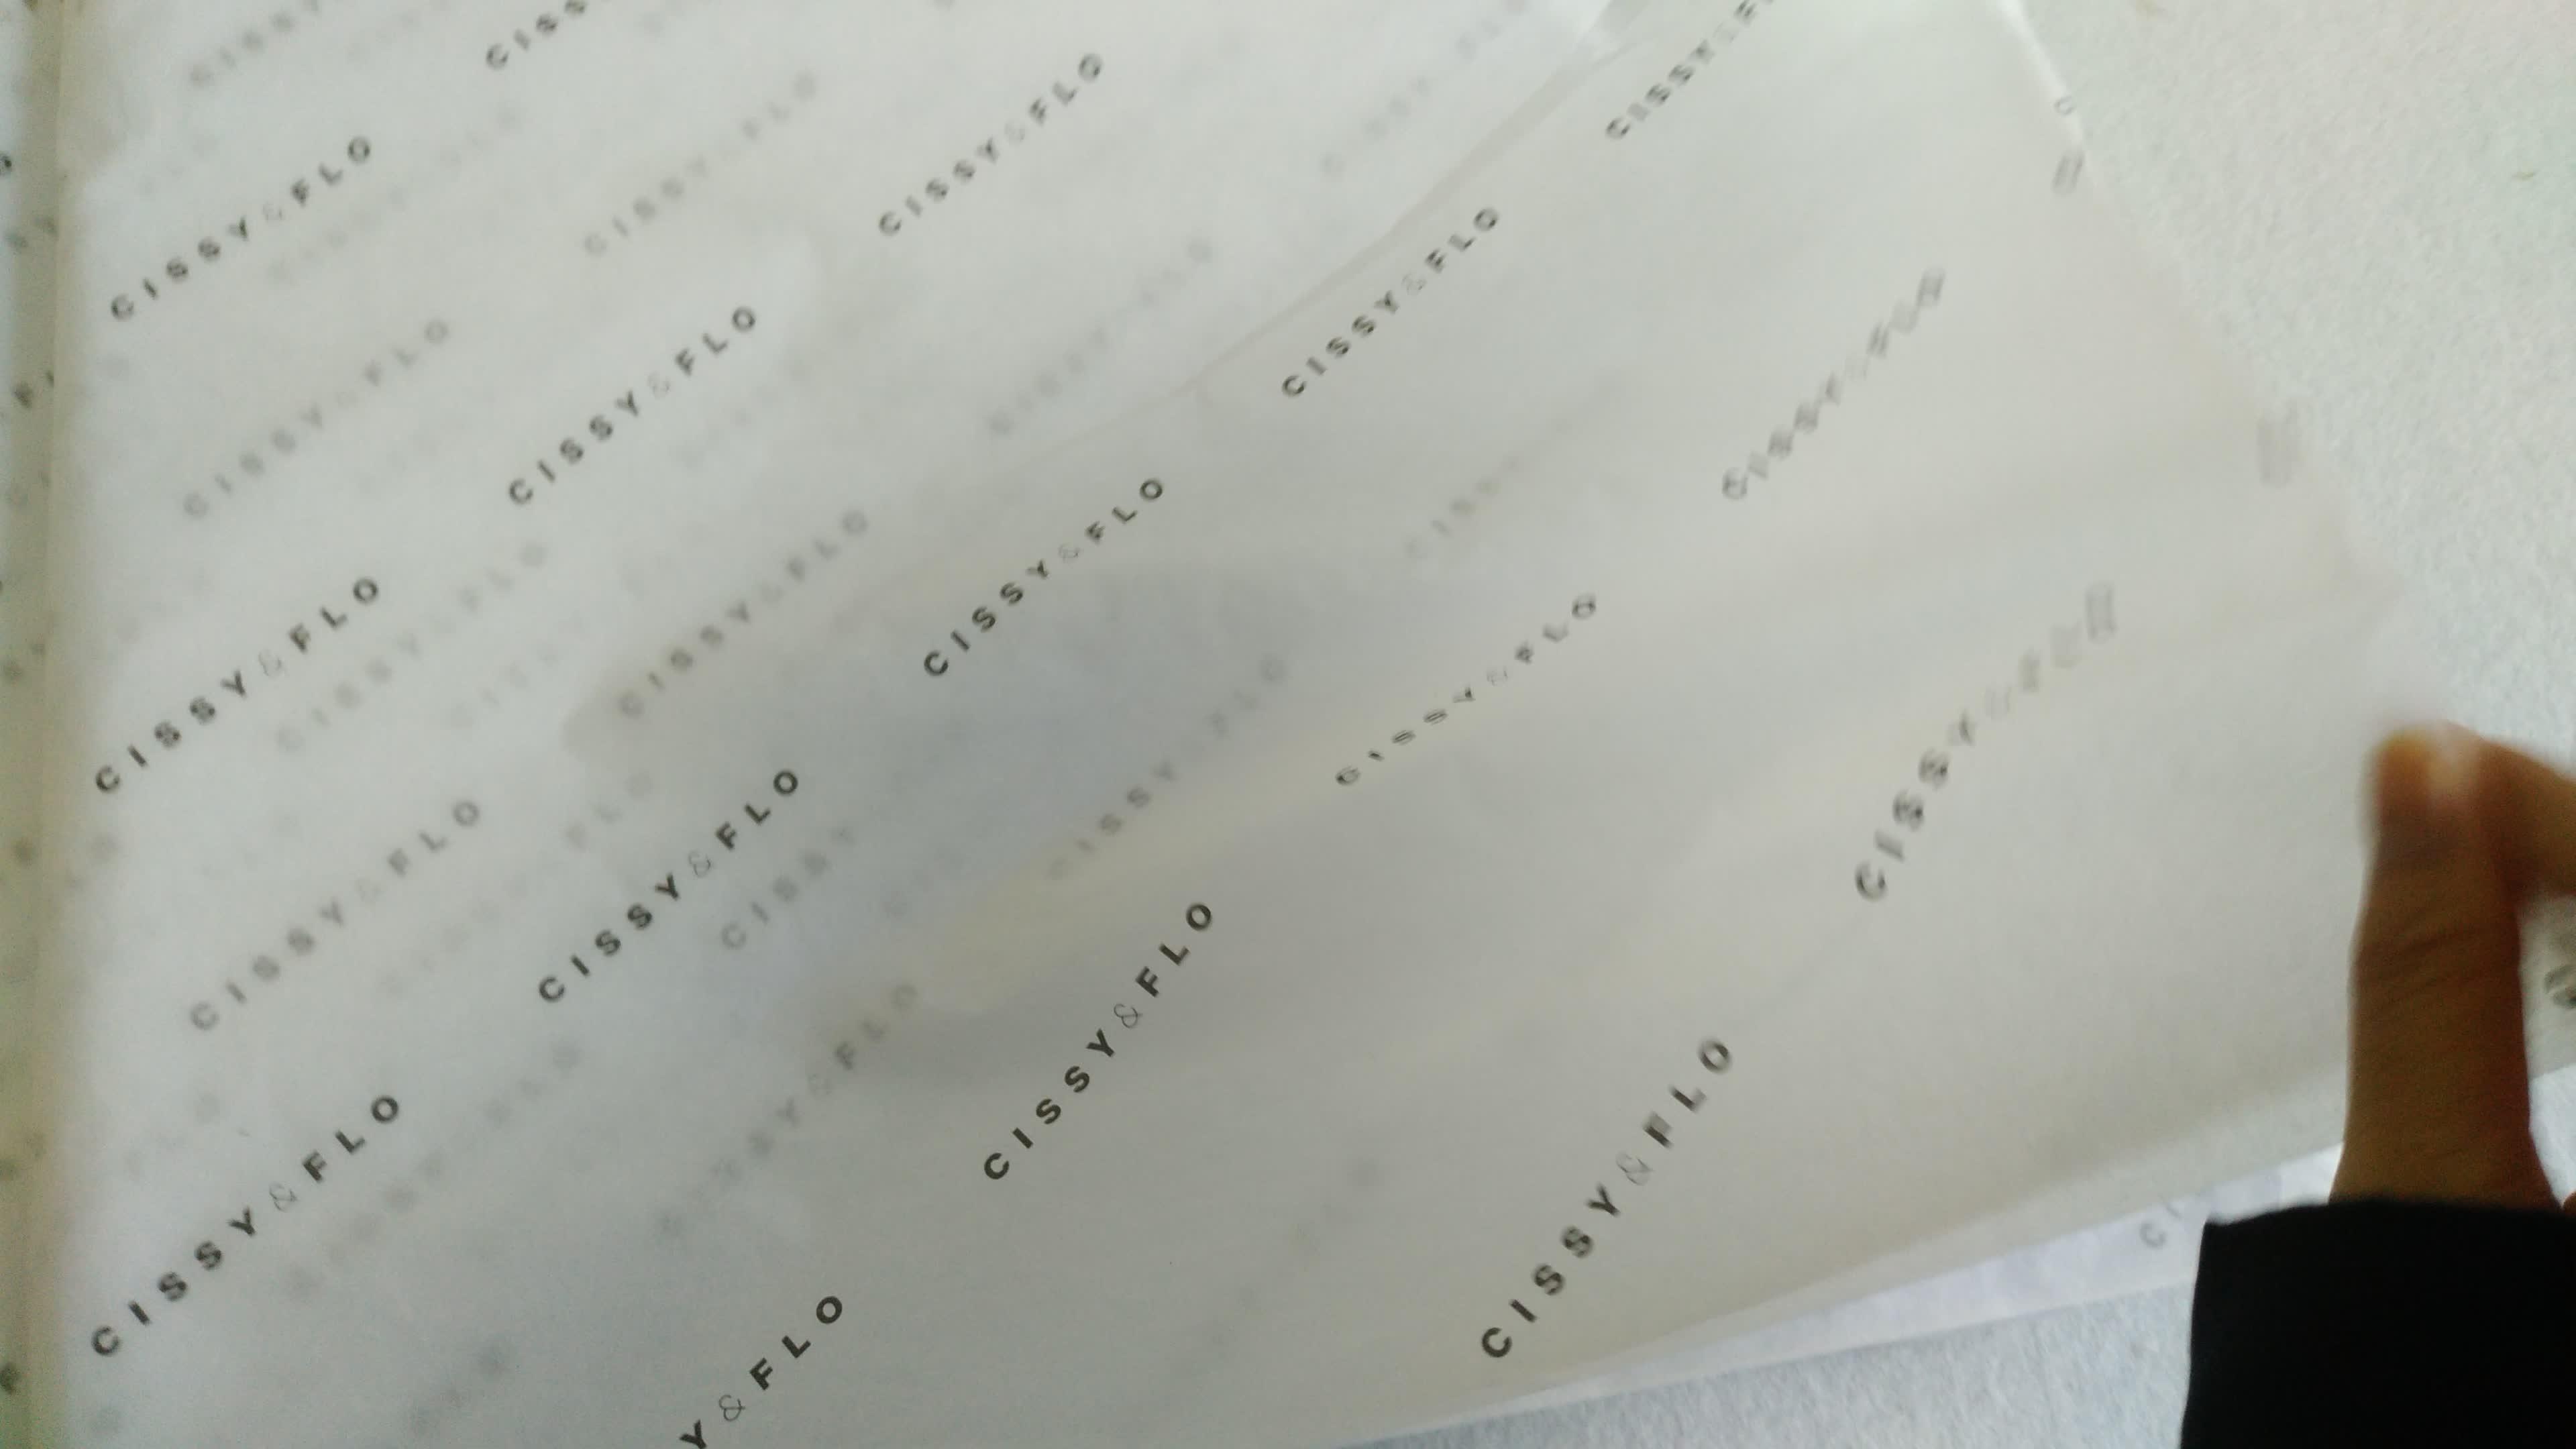 Custom printed logo 17g] 랩핑 조직 종이 대 한 옷